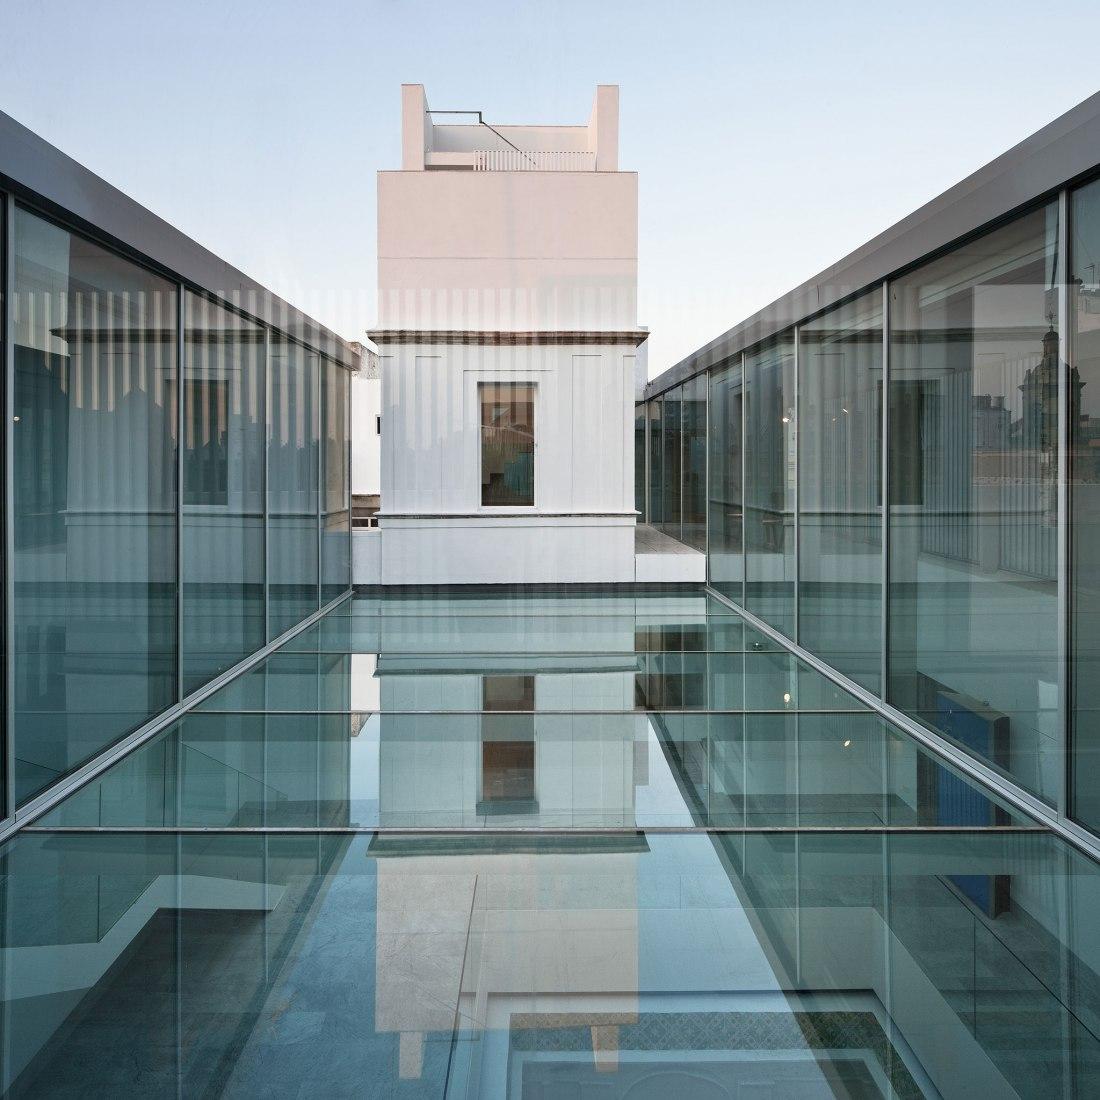 Casa Pinillos, Cadiz museum expansion by Reina & Asociados. Photograph © Fernando Alda